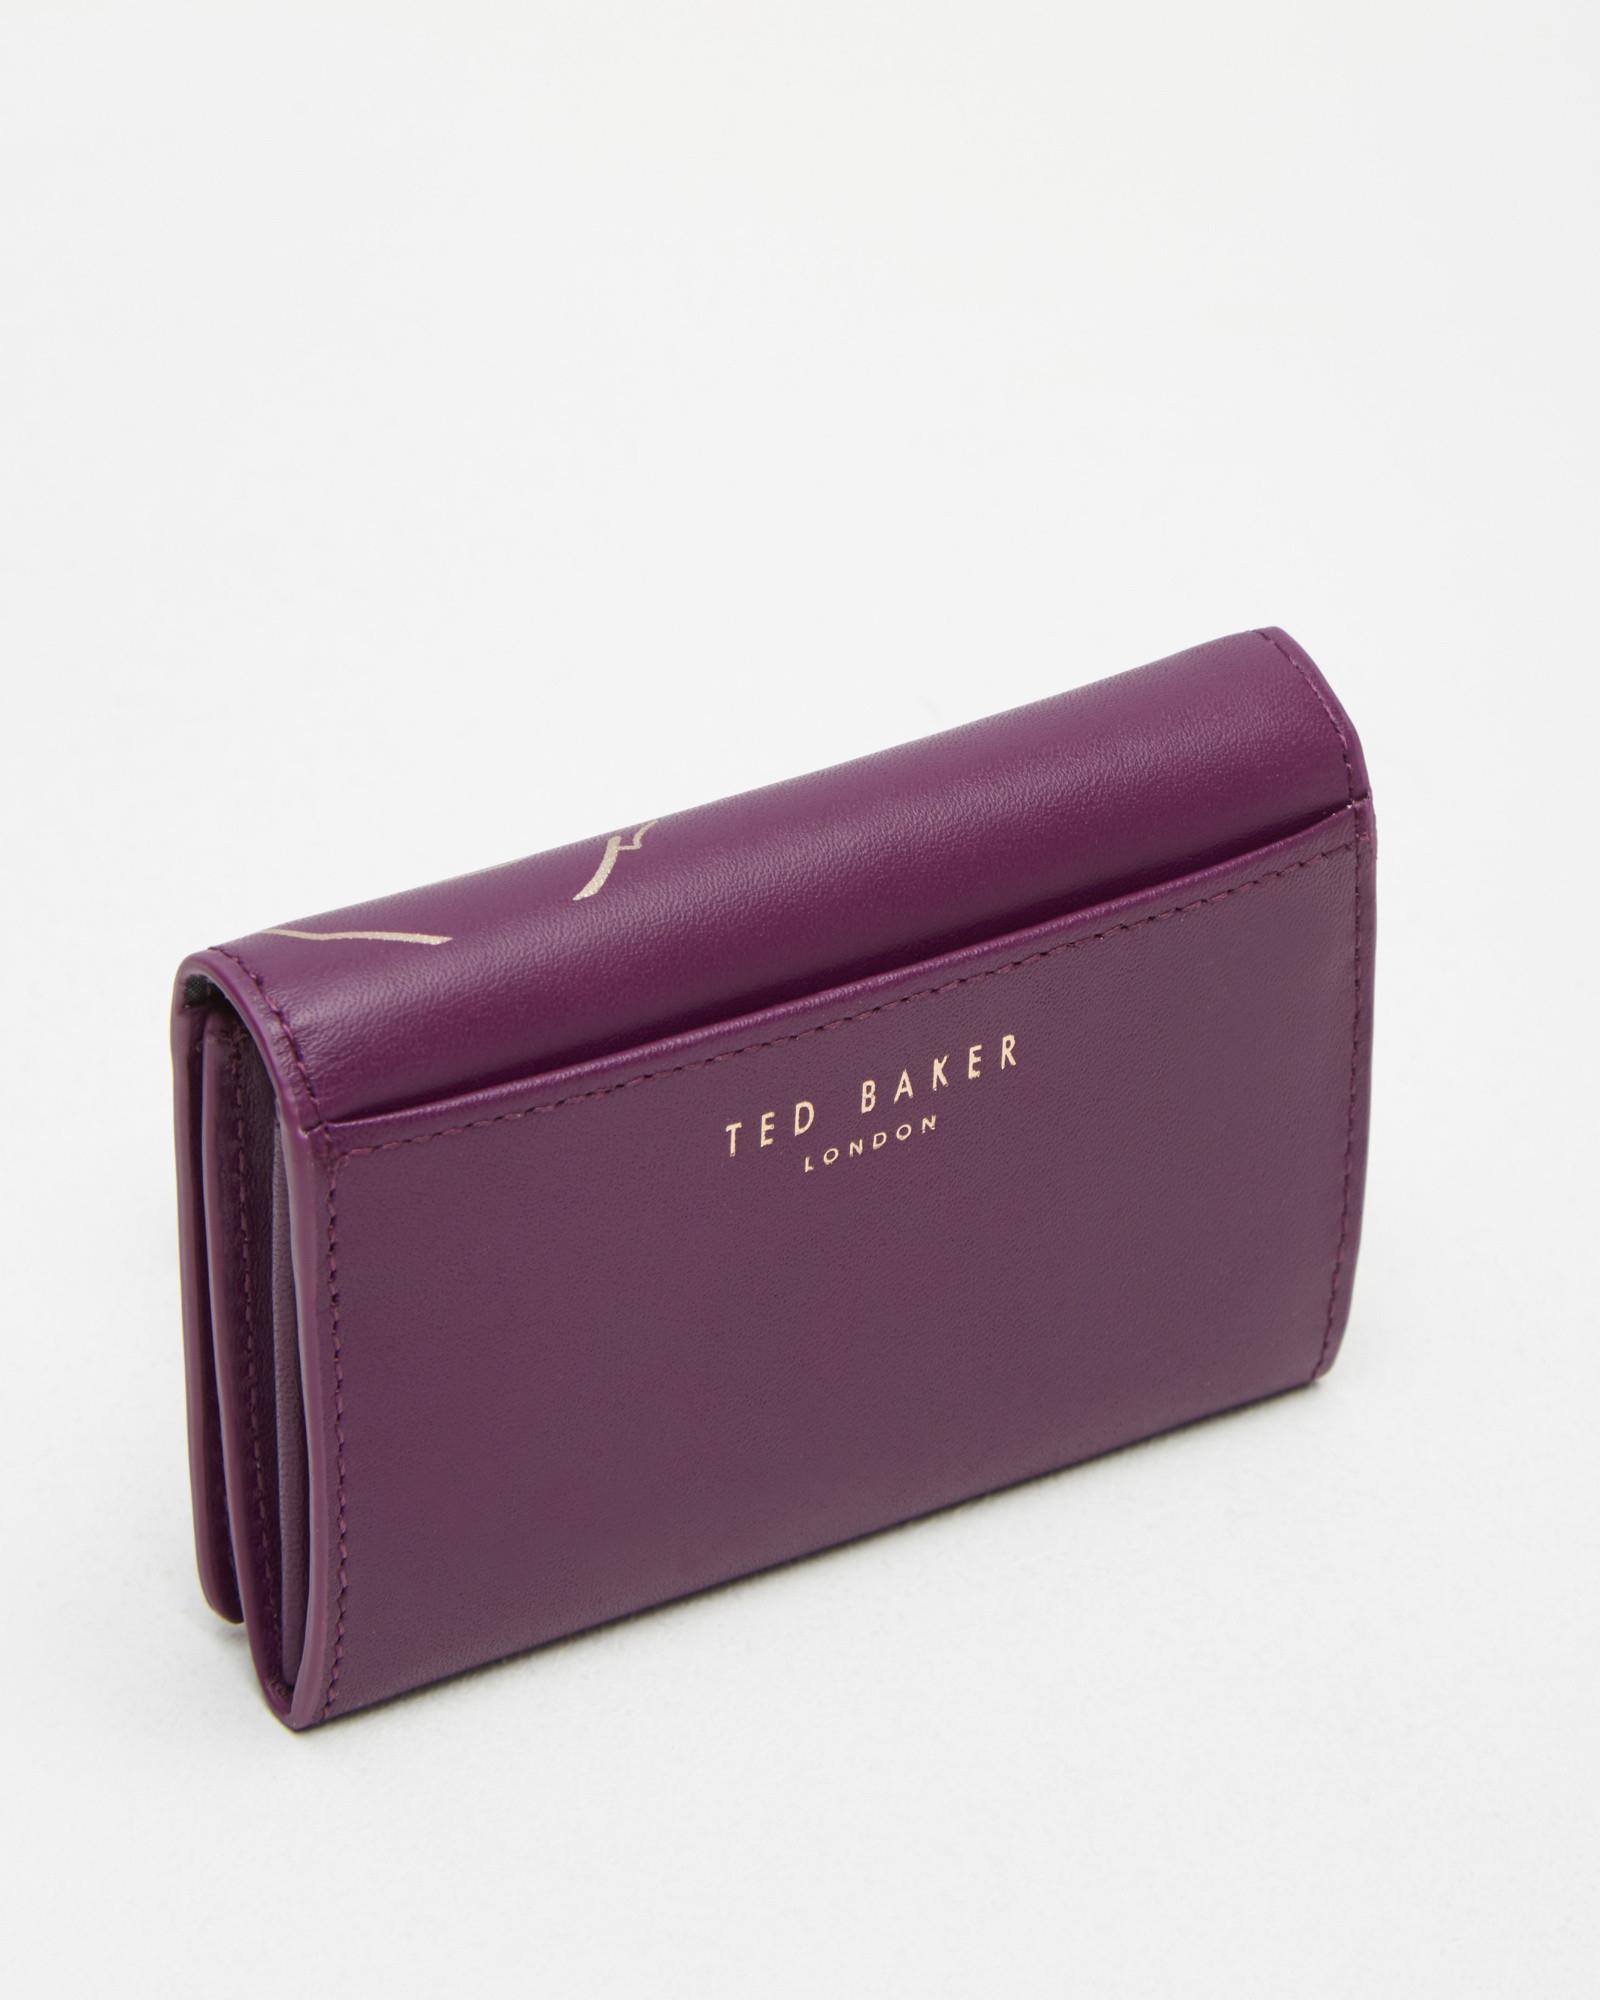 b89a566f5287 Ted Baker Bear Foil Detail Leather Purse in Purple - Lyst